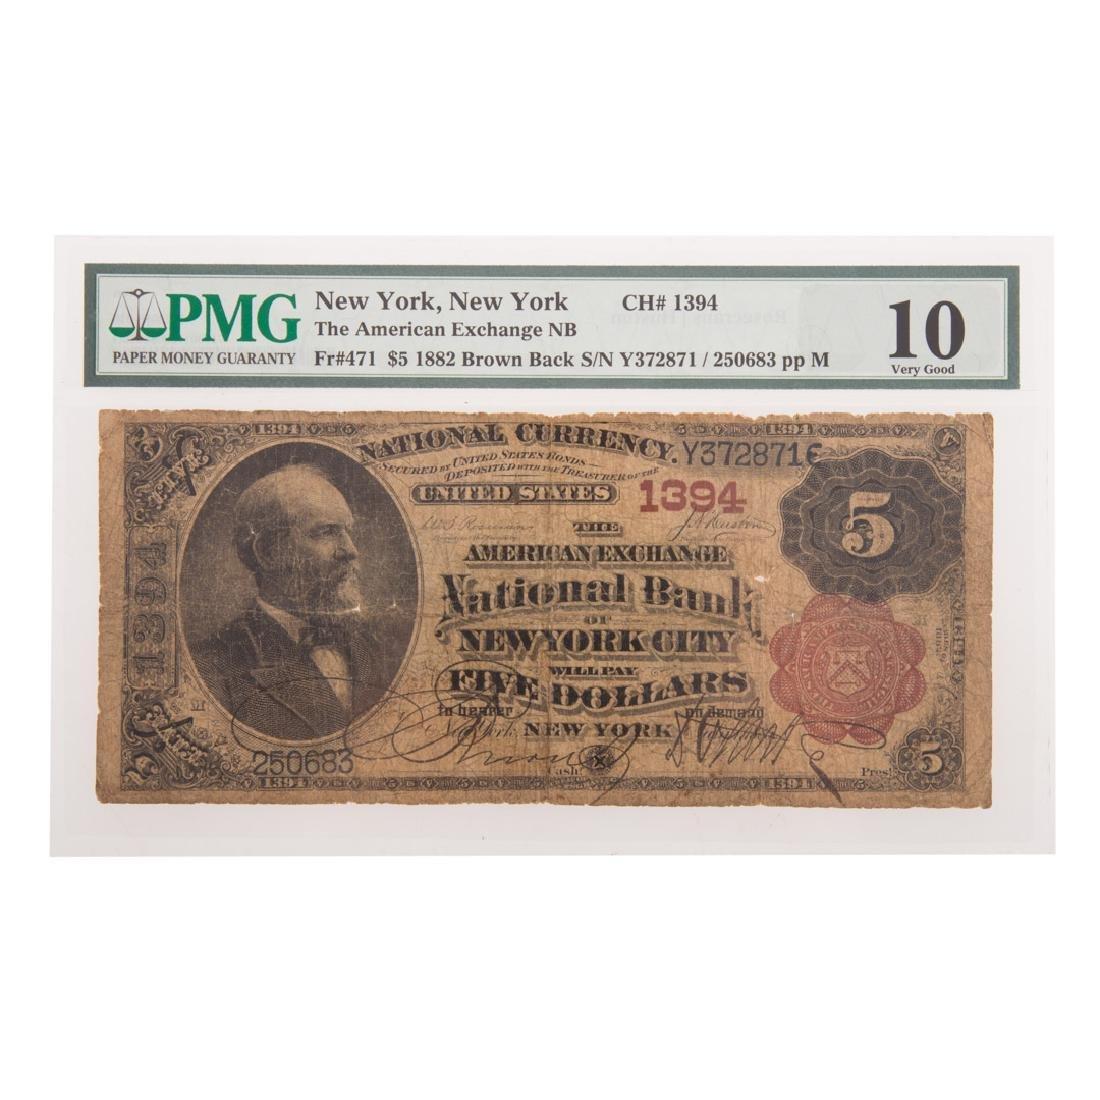 [US] $5 1882 Brown Back CH#1394 Fr-471 PMG VG-10